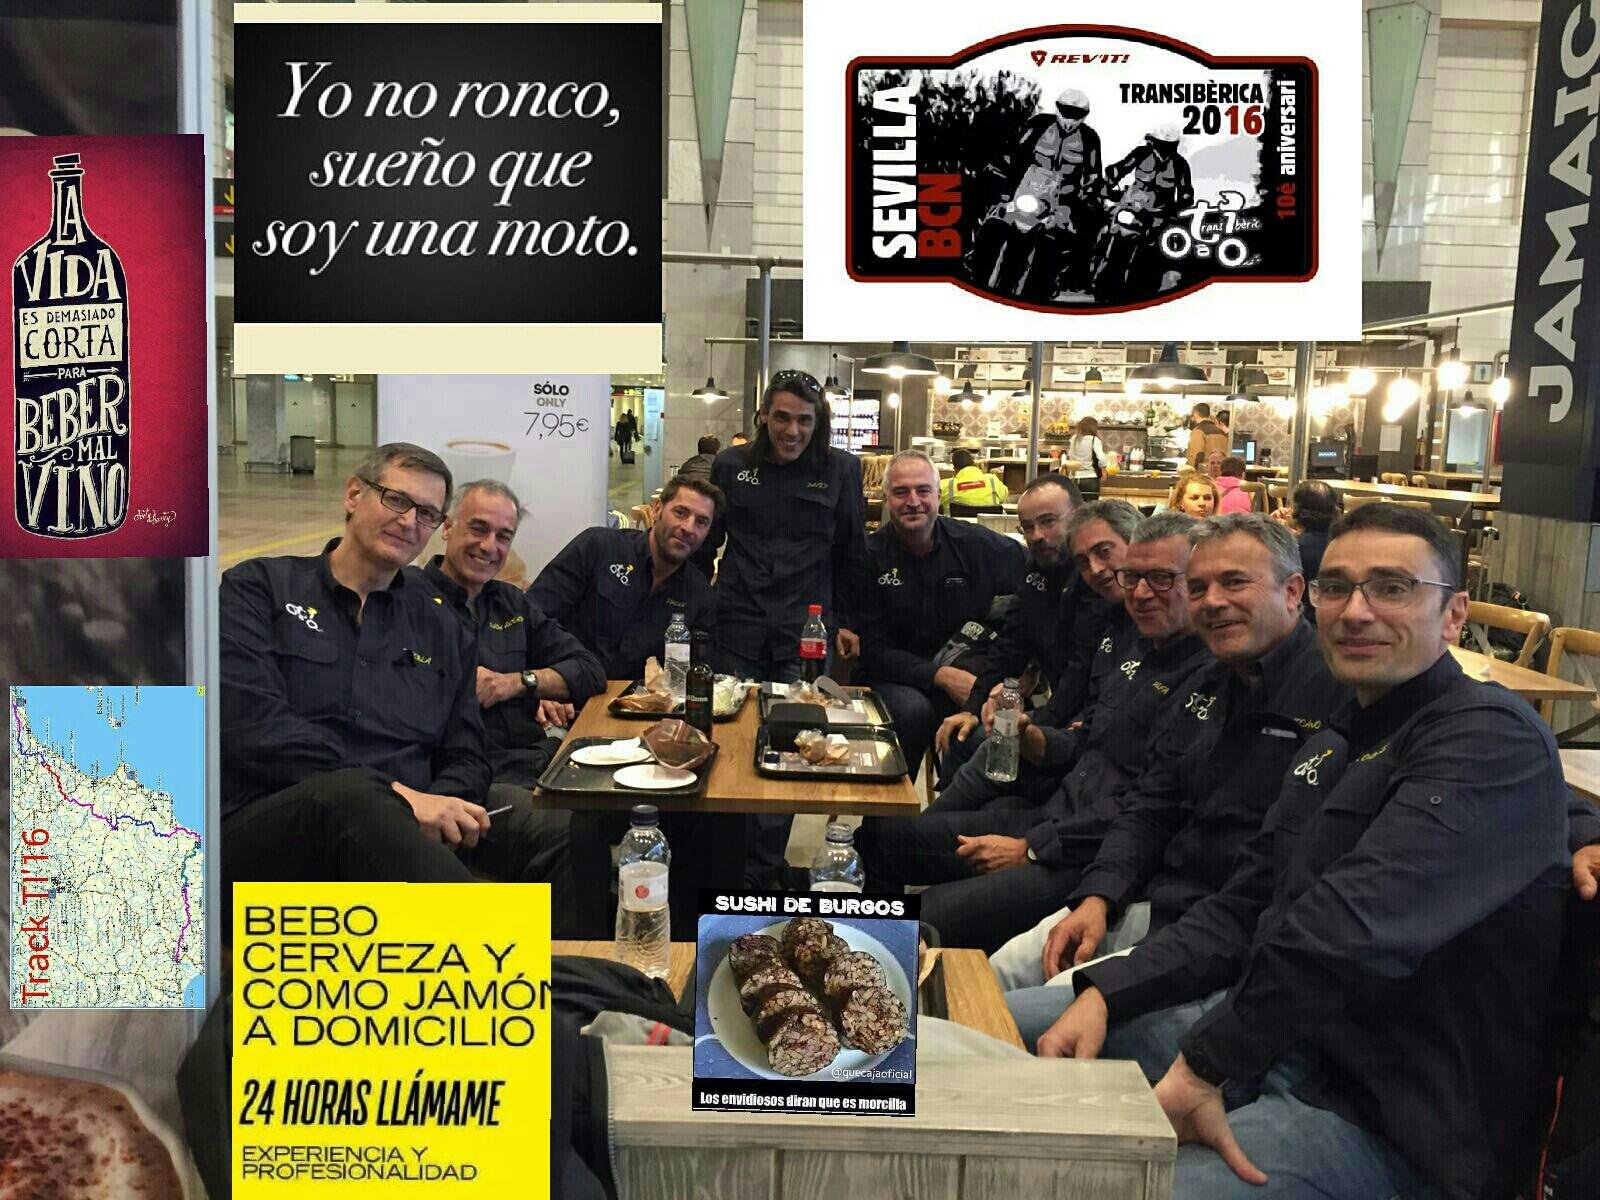 Ya estamos en marcha: Transiberica 2016. Sevilla-Almeria-Barcelona